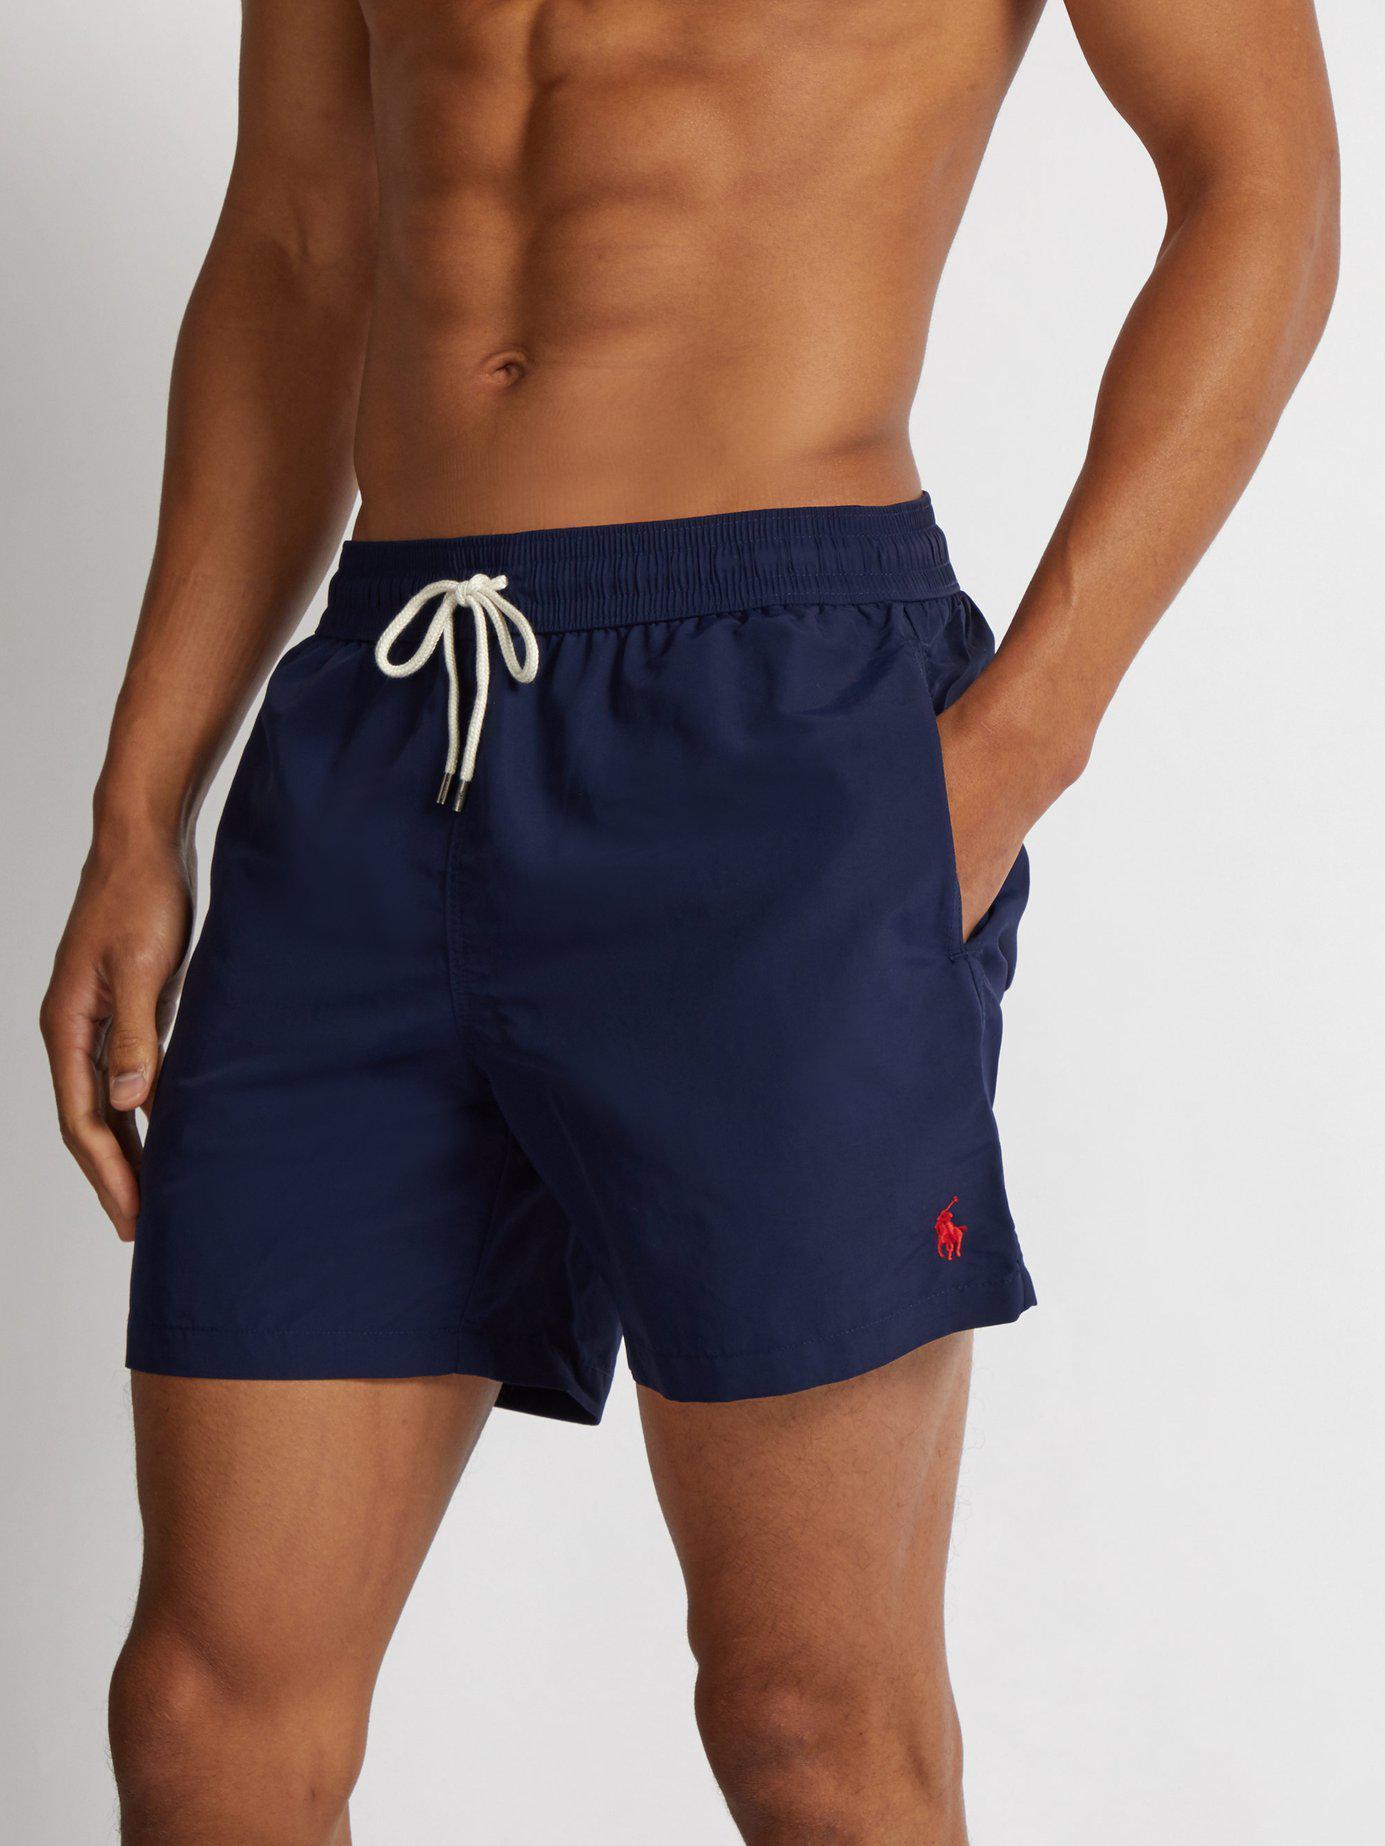 aeb02cad0 ... low cost polo ralph lauren blue block colour swim shorts for men lyst.  view fullscreen